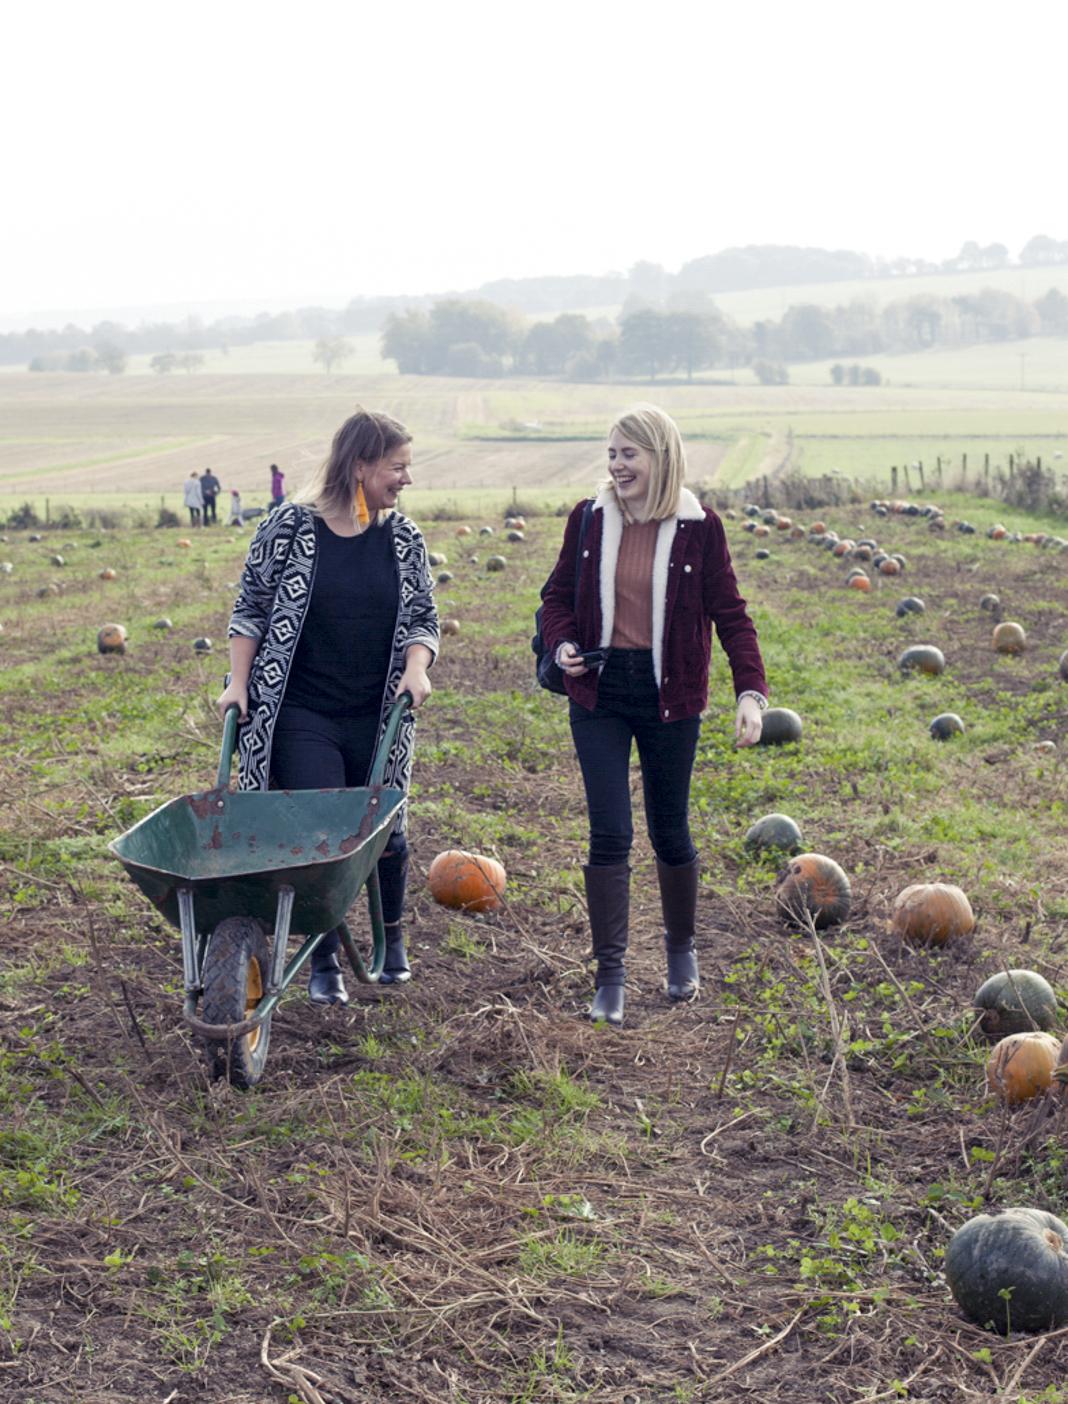 2 girls pumpkin picking with a green wheelbarrow at farmer copley in pontefract